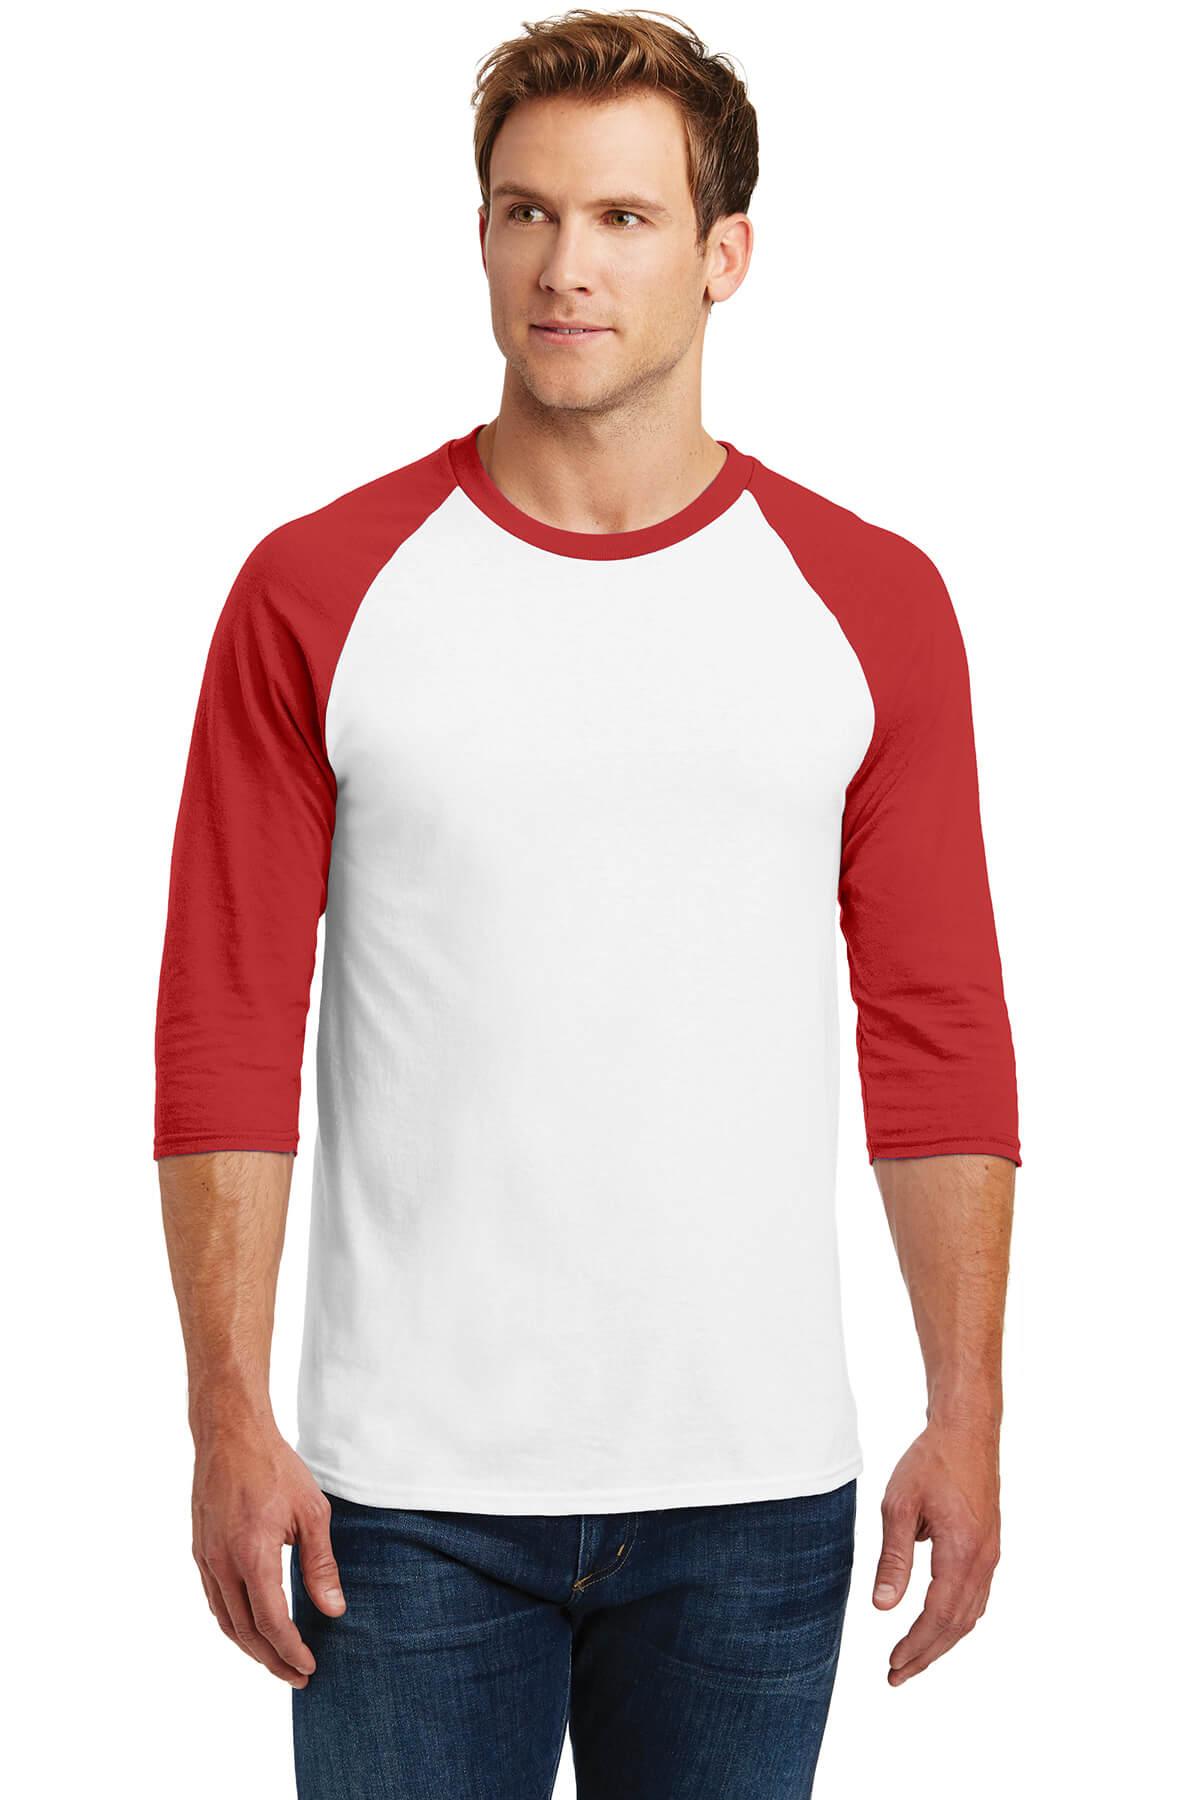 5700-white-red-1